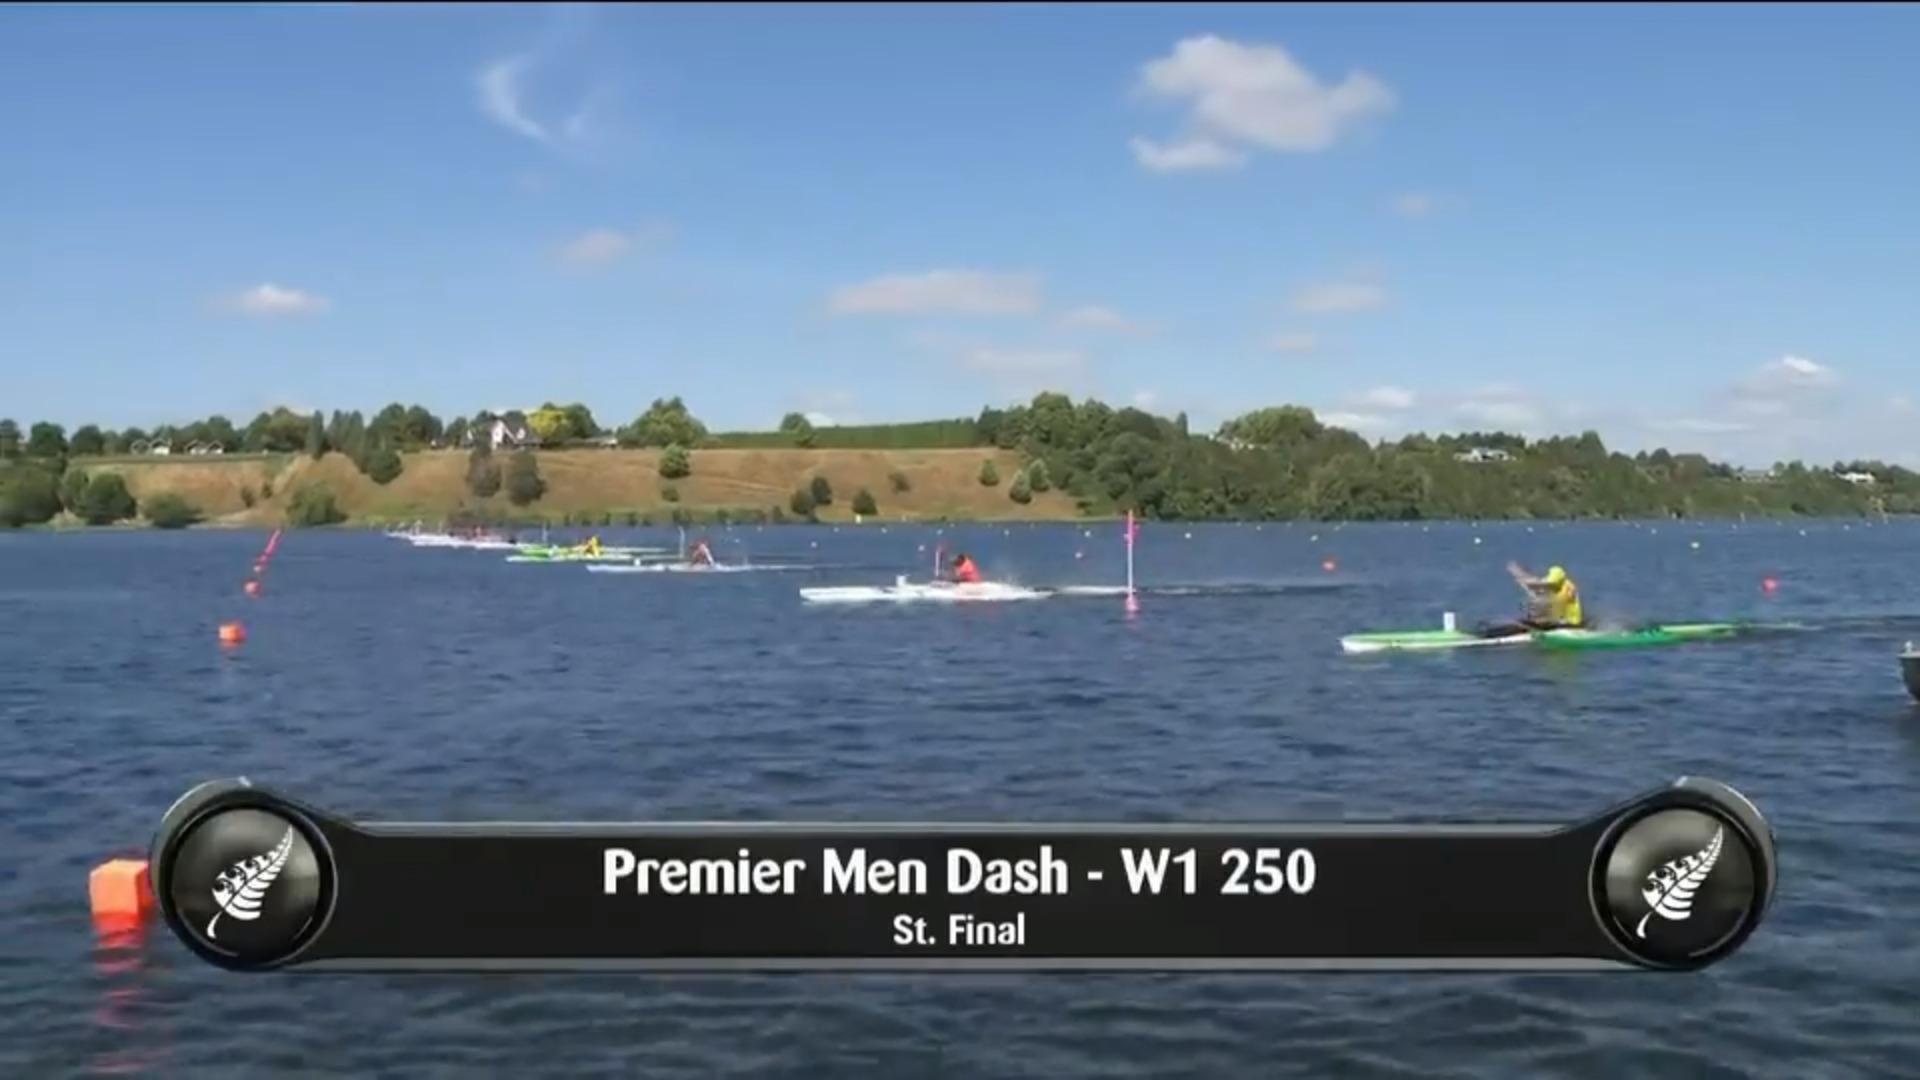 Video for 2019 Waka Ama Sprints - Premier Men Dash - W1 250 St.Final